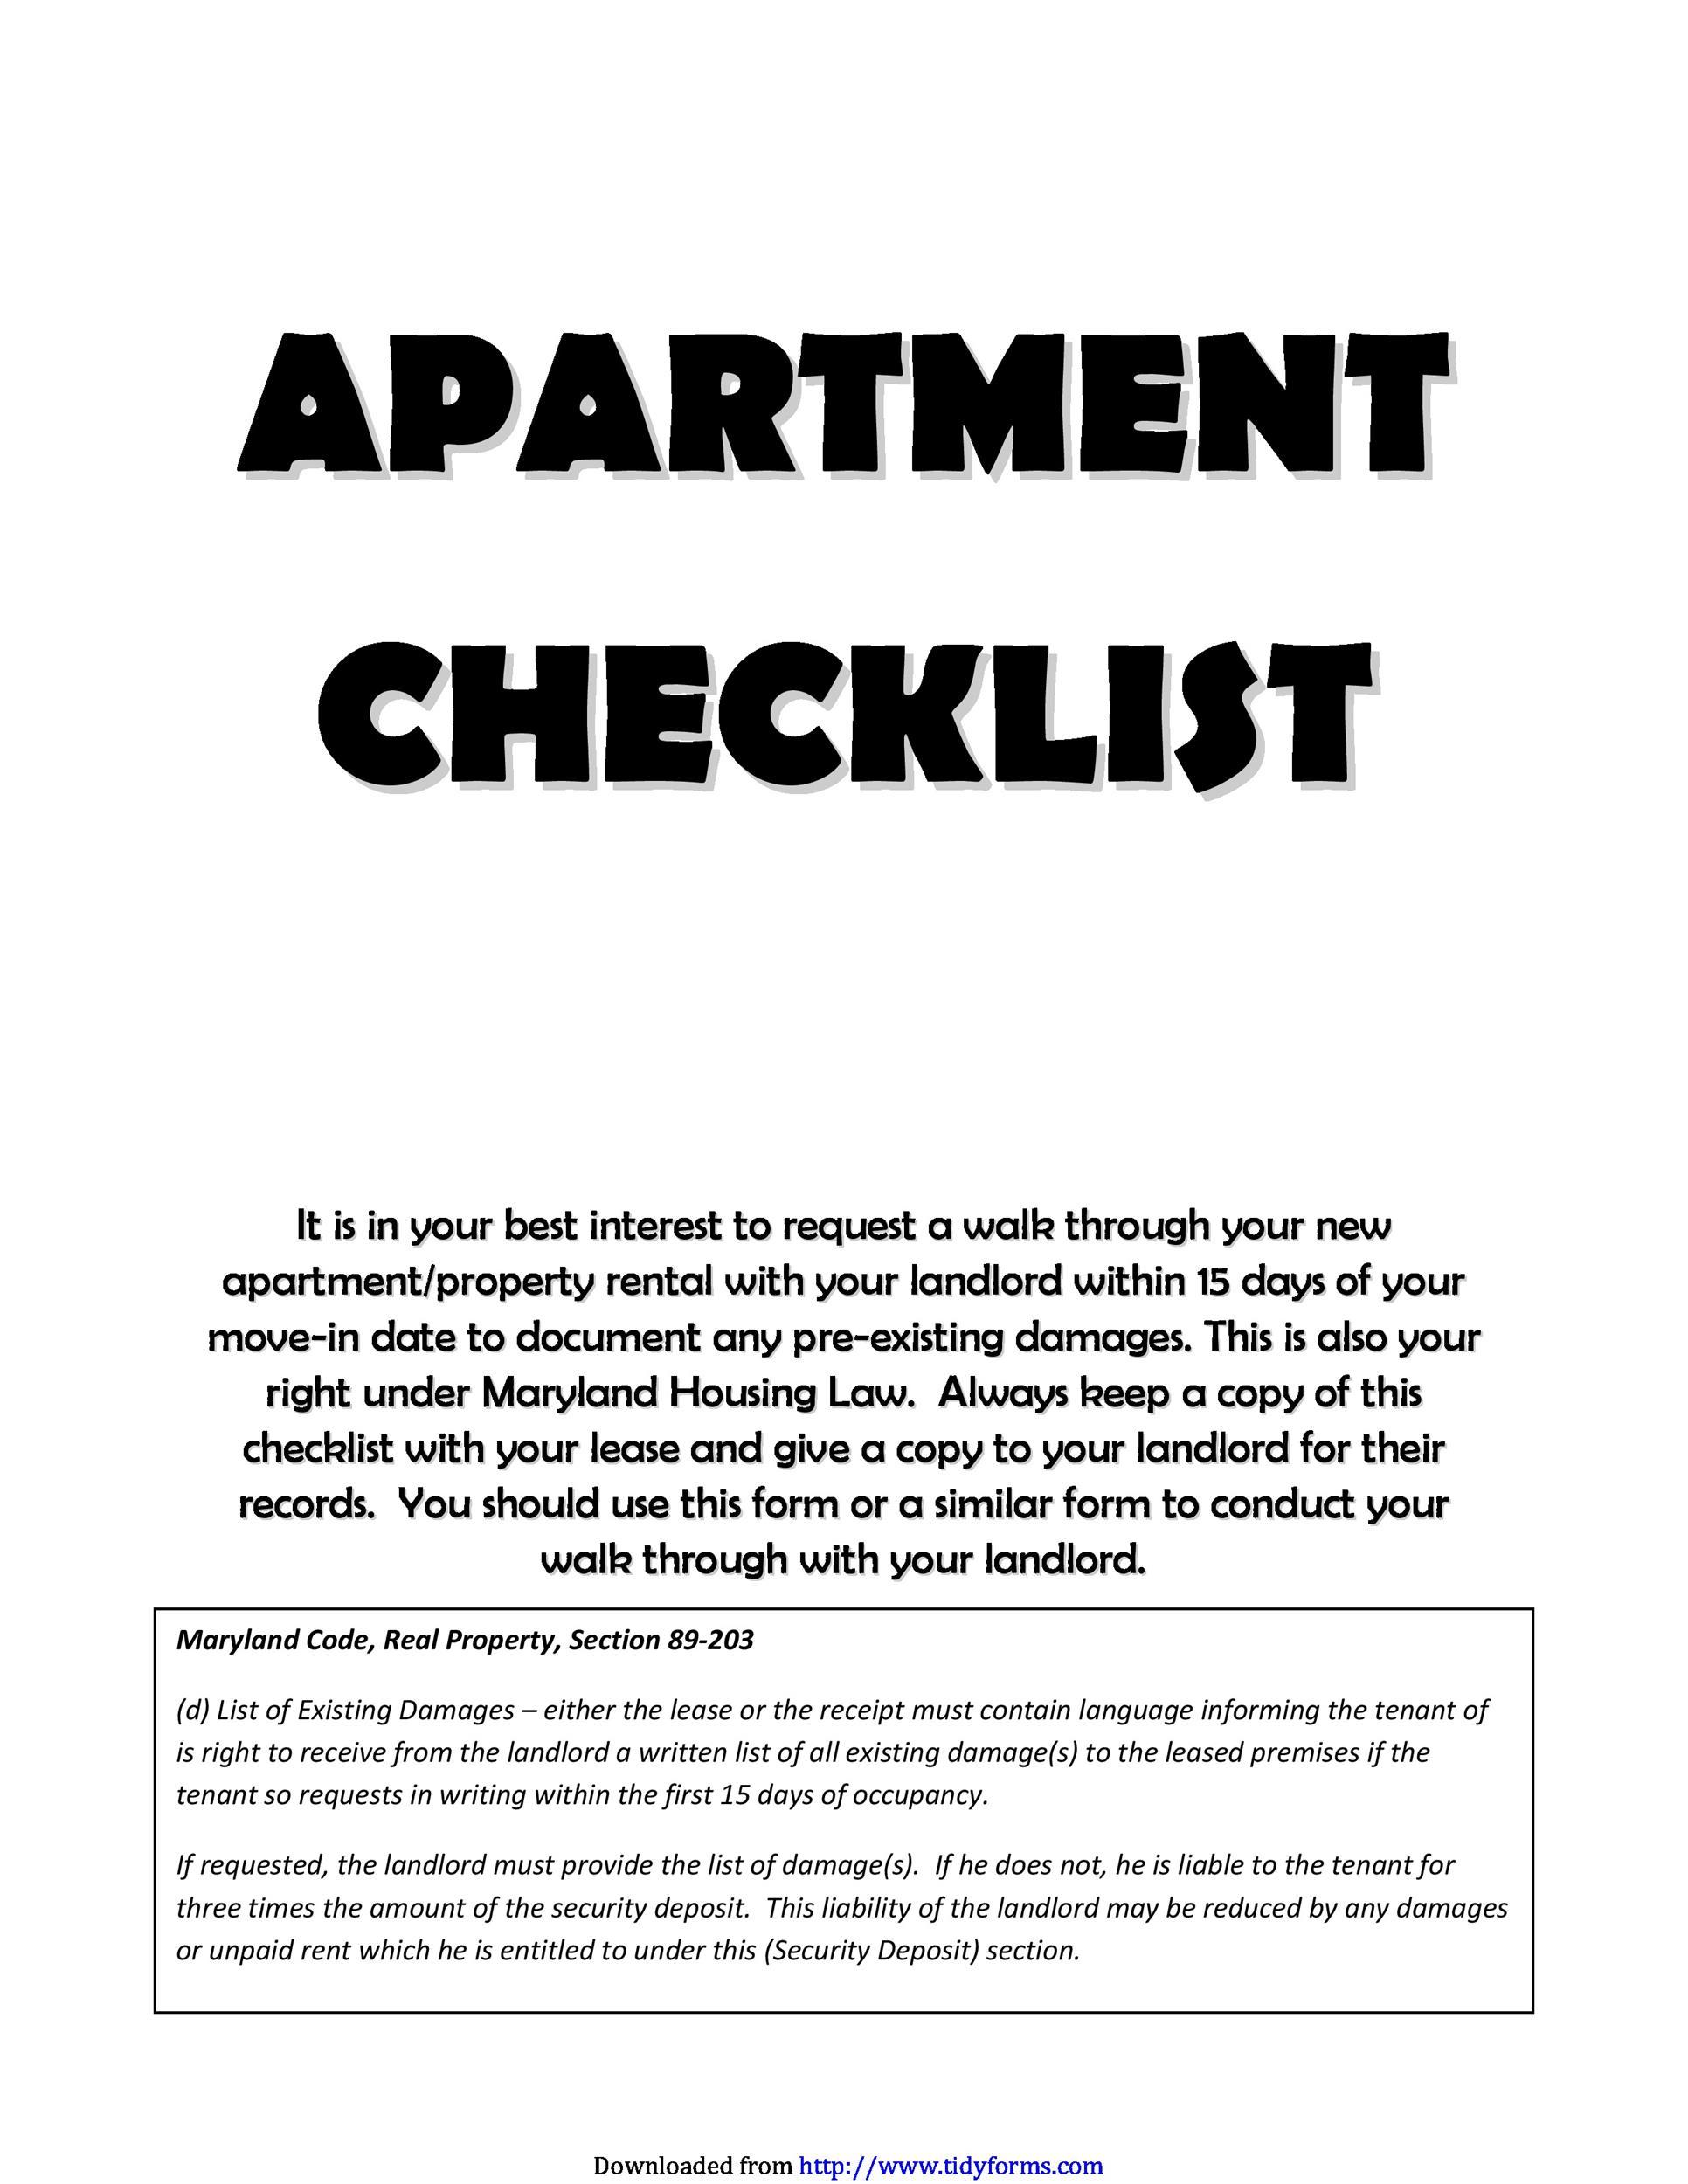 Free apartment checklist 13